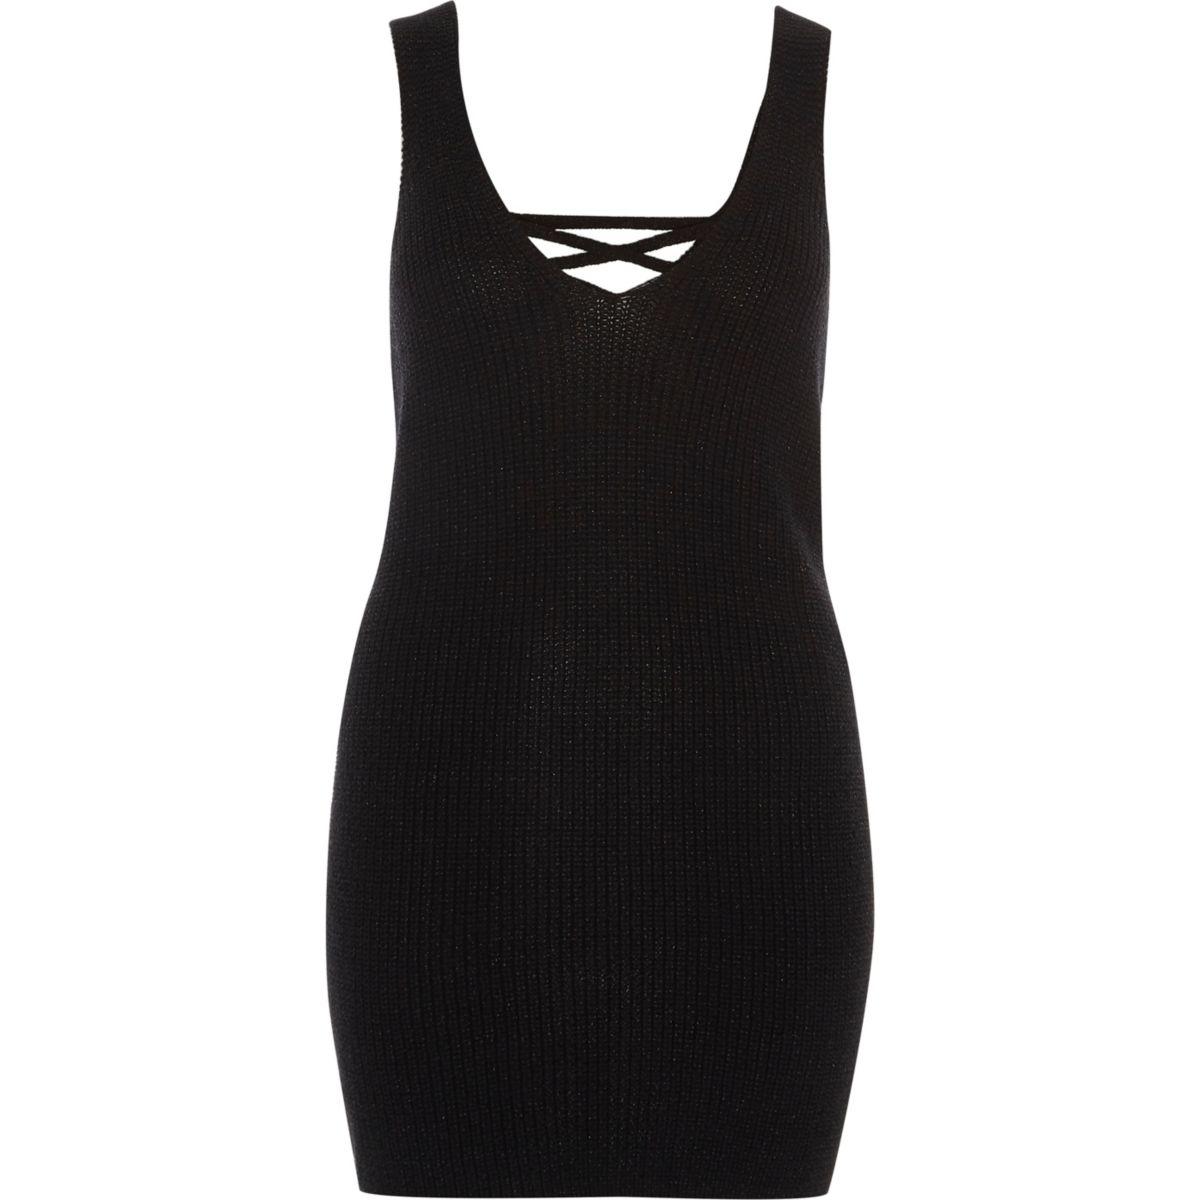 Black lace-up back side spit knitted tank